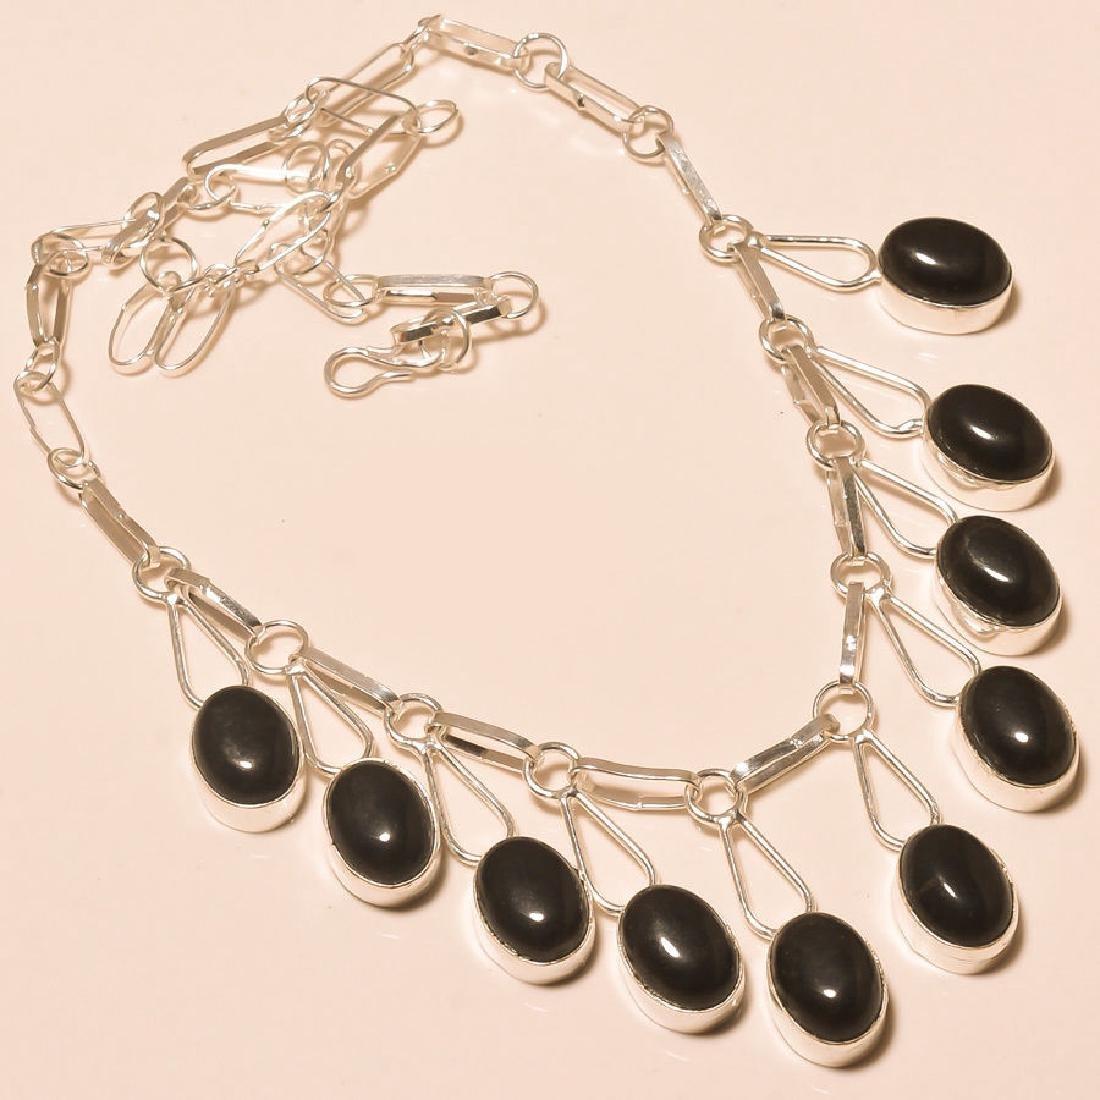 Shining Black Onyx Marvelous .925 Silver Necklace